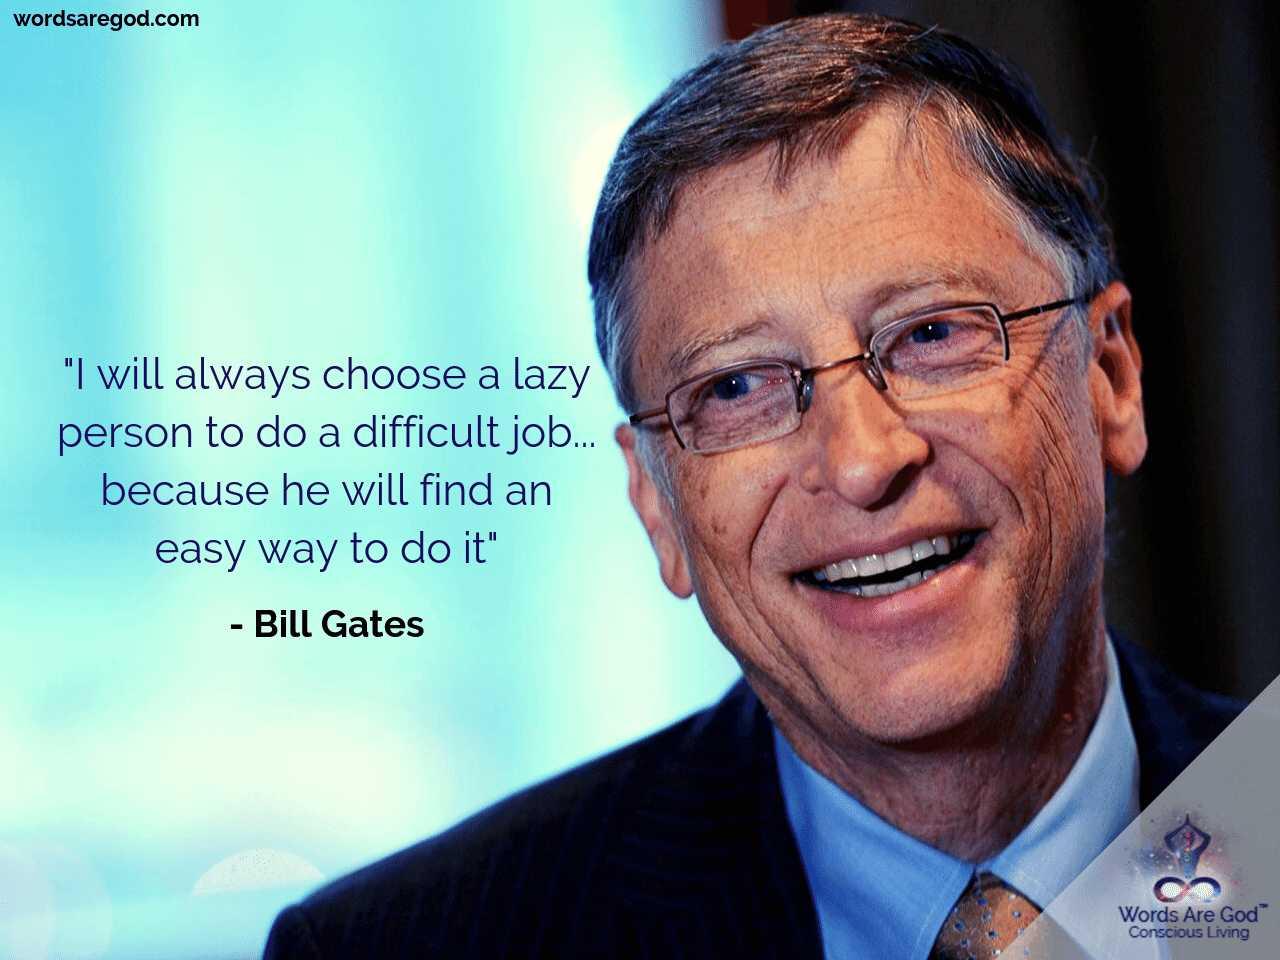 Bill Gates Motivational quote